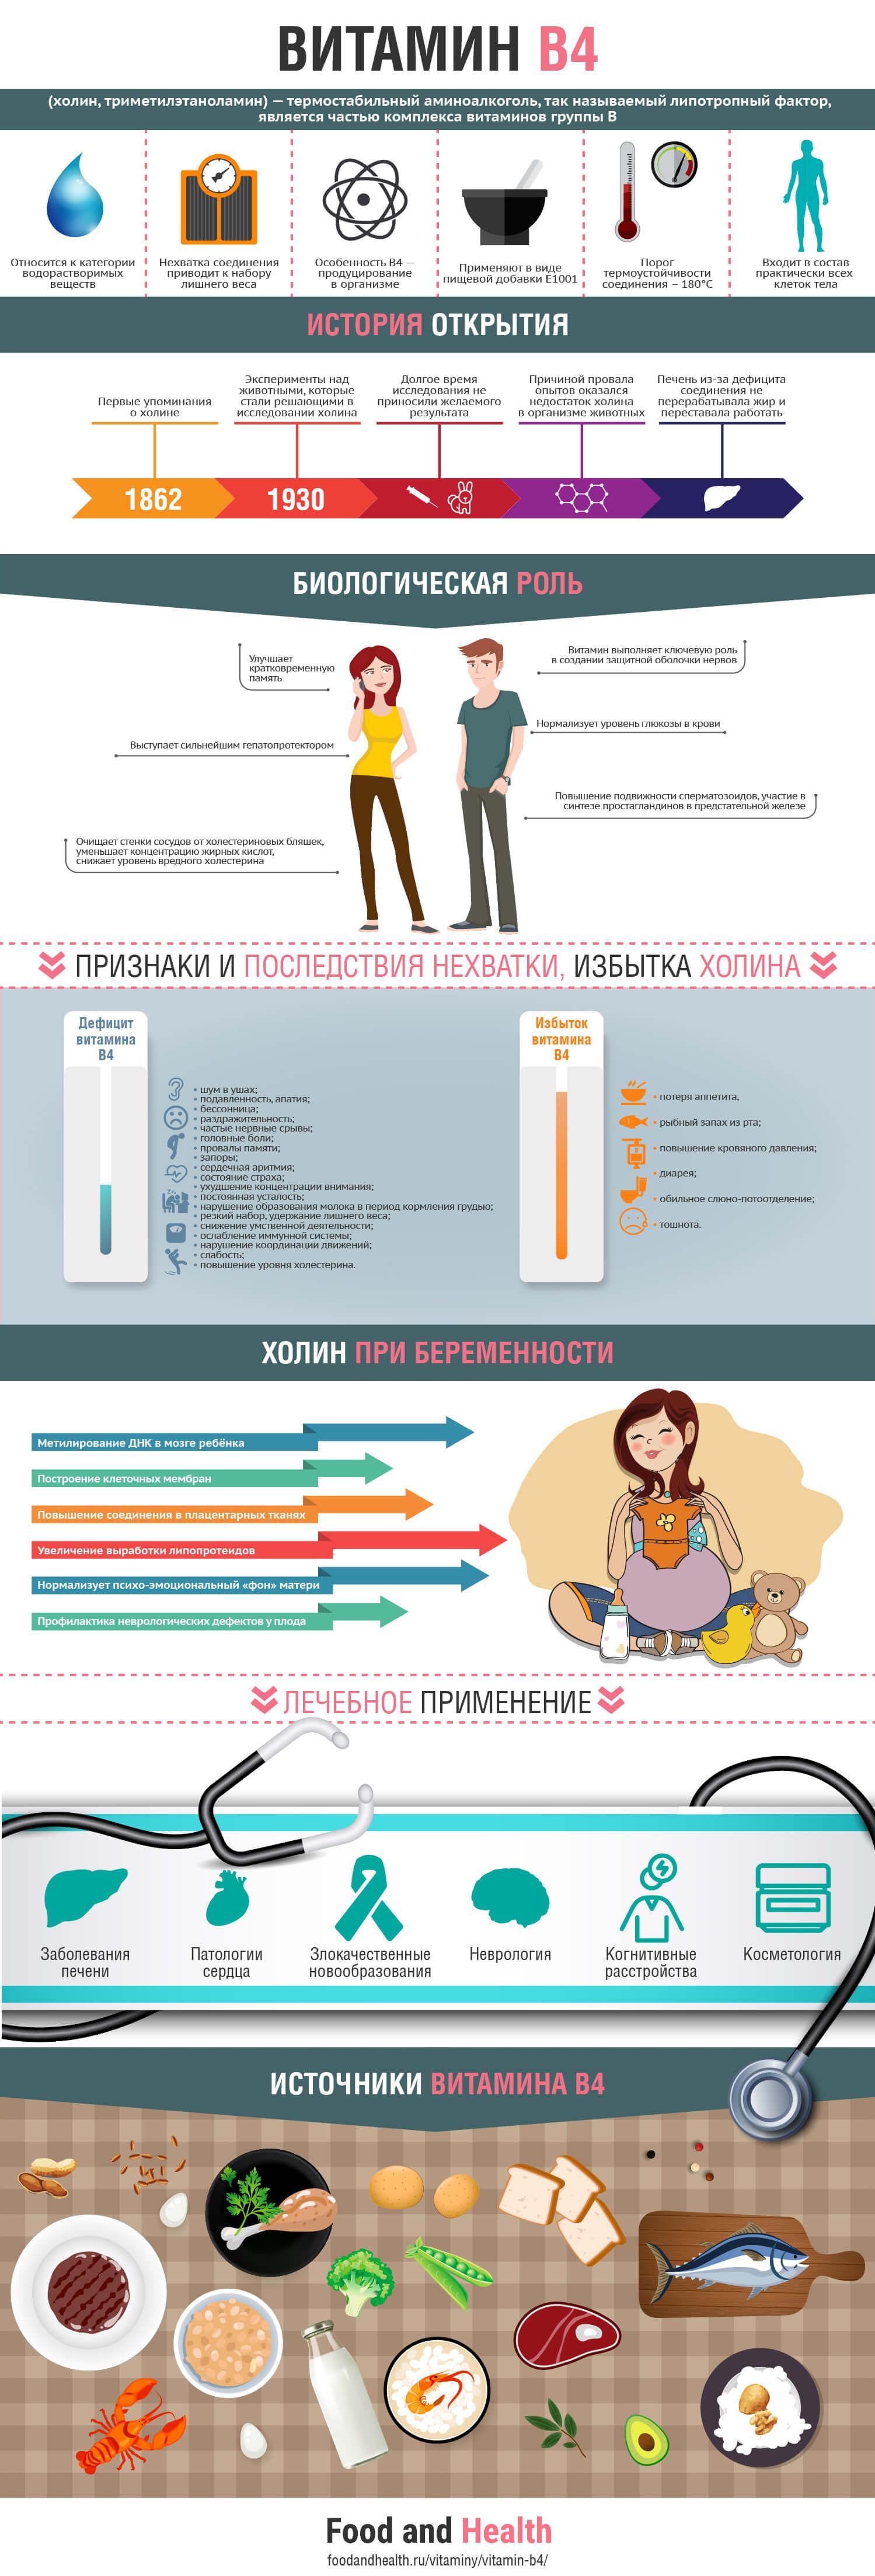 Витамин B4: инфографика